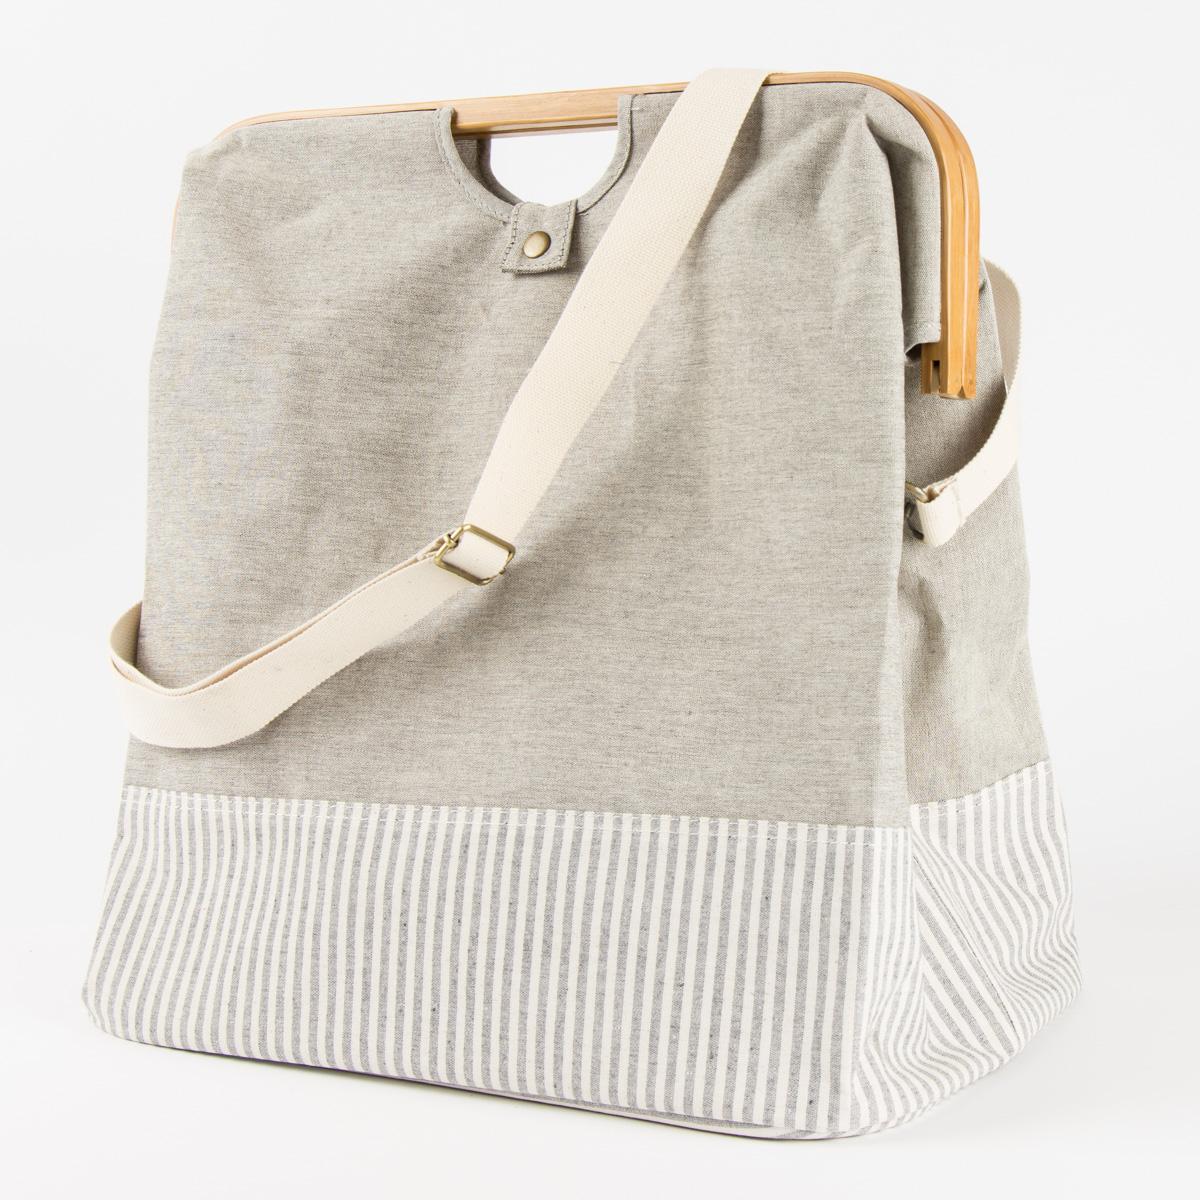 Prym Tasche Store & Travel Bag M grau